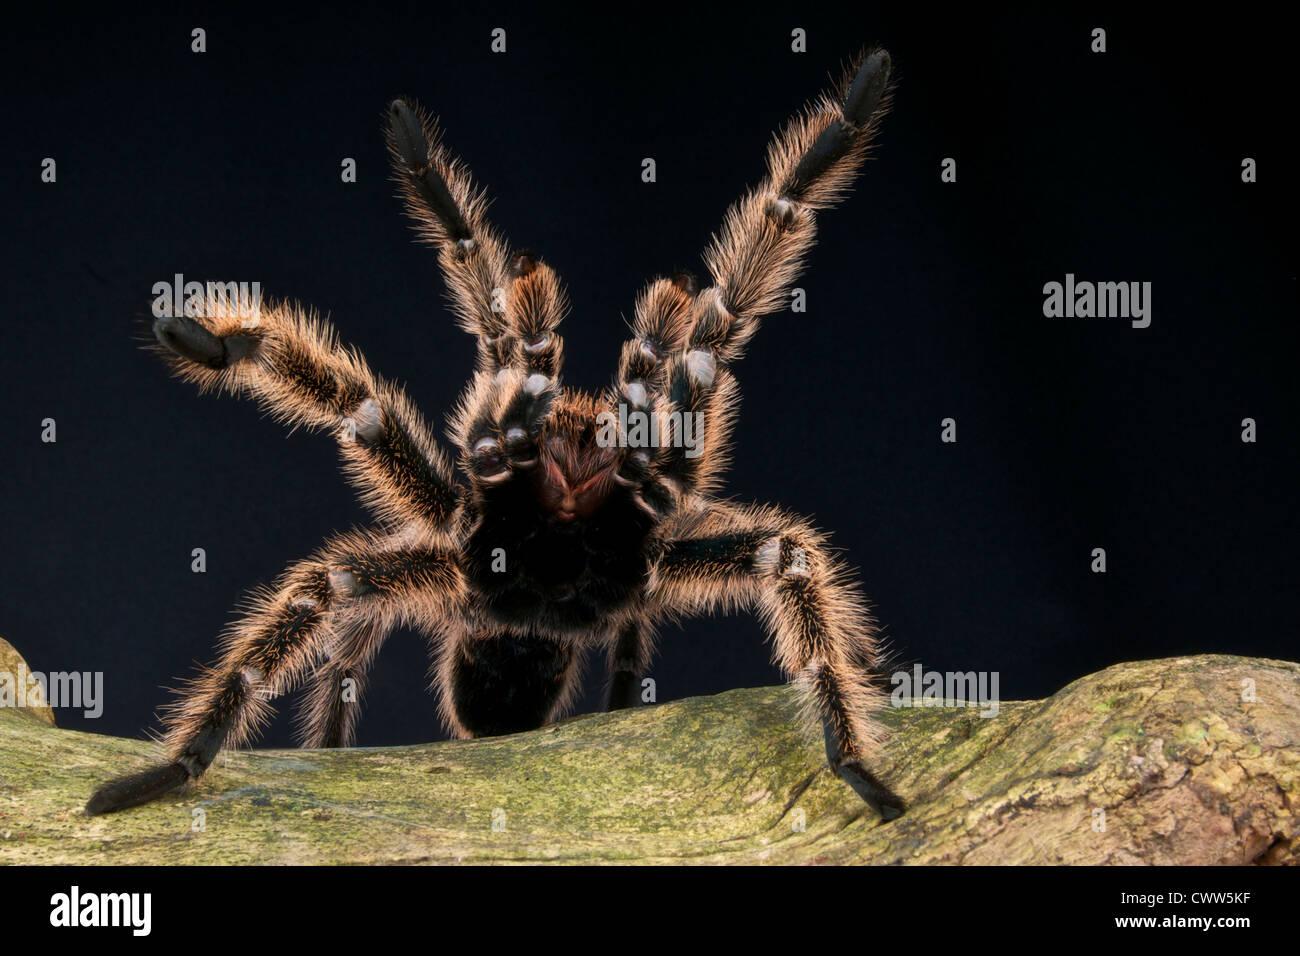 Tarantula attacking / Avicularia urticans Stock Photo